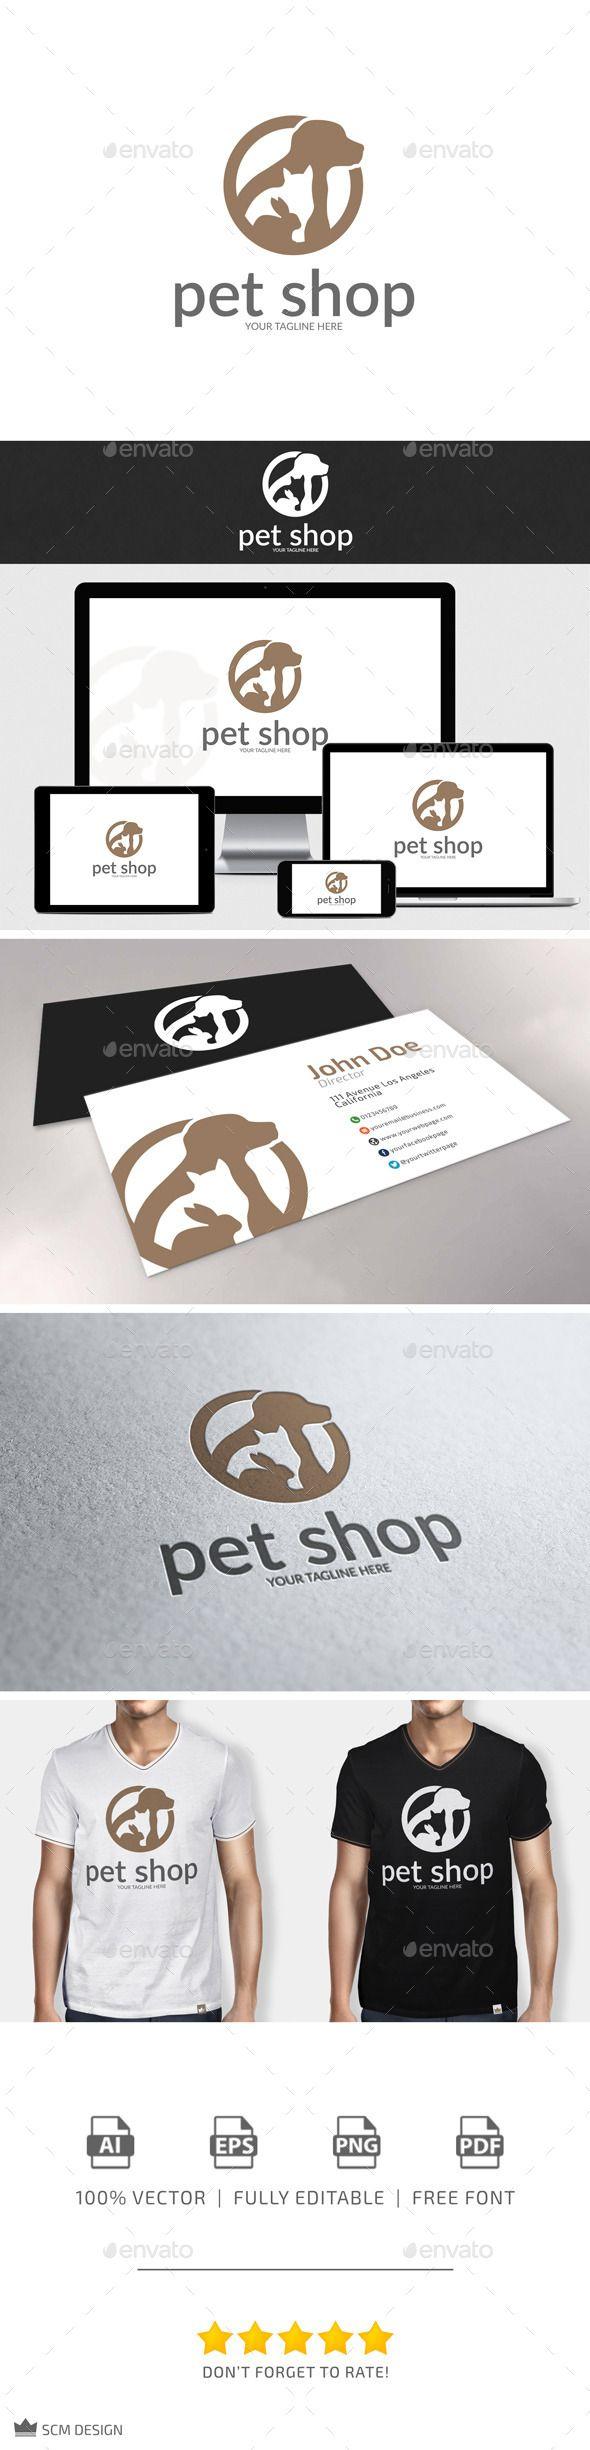 Pet Shop Logo — Transparent PNG #cat #brand • Available here → https://graphicriver.net/item/pet-shop-logo/9951084?ref=pxcr